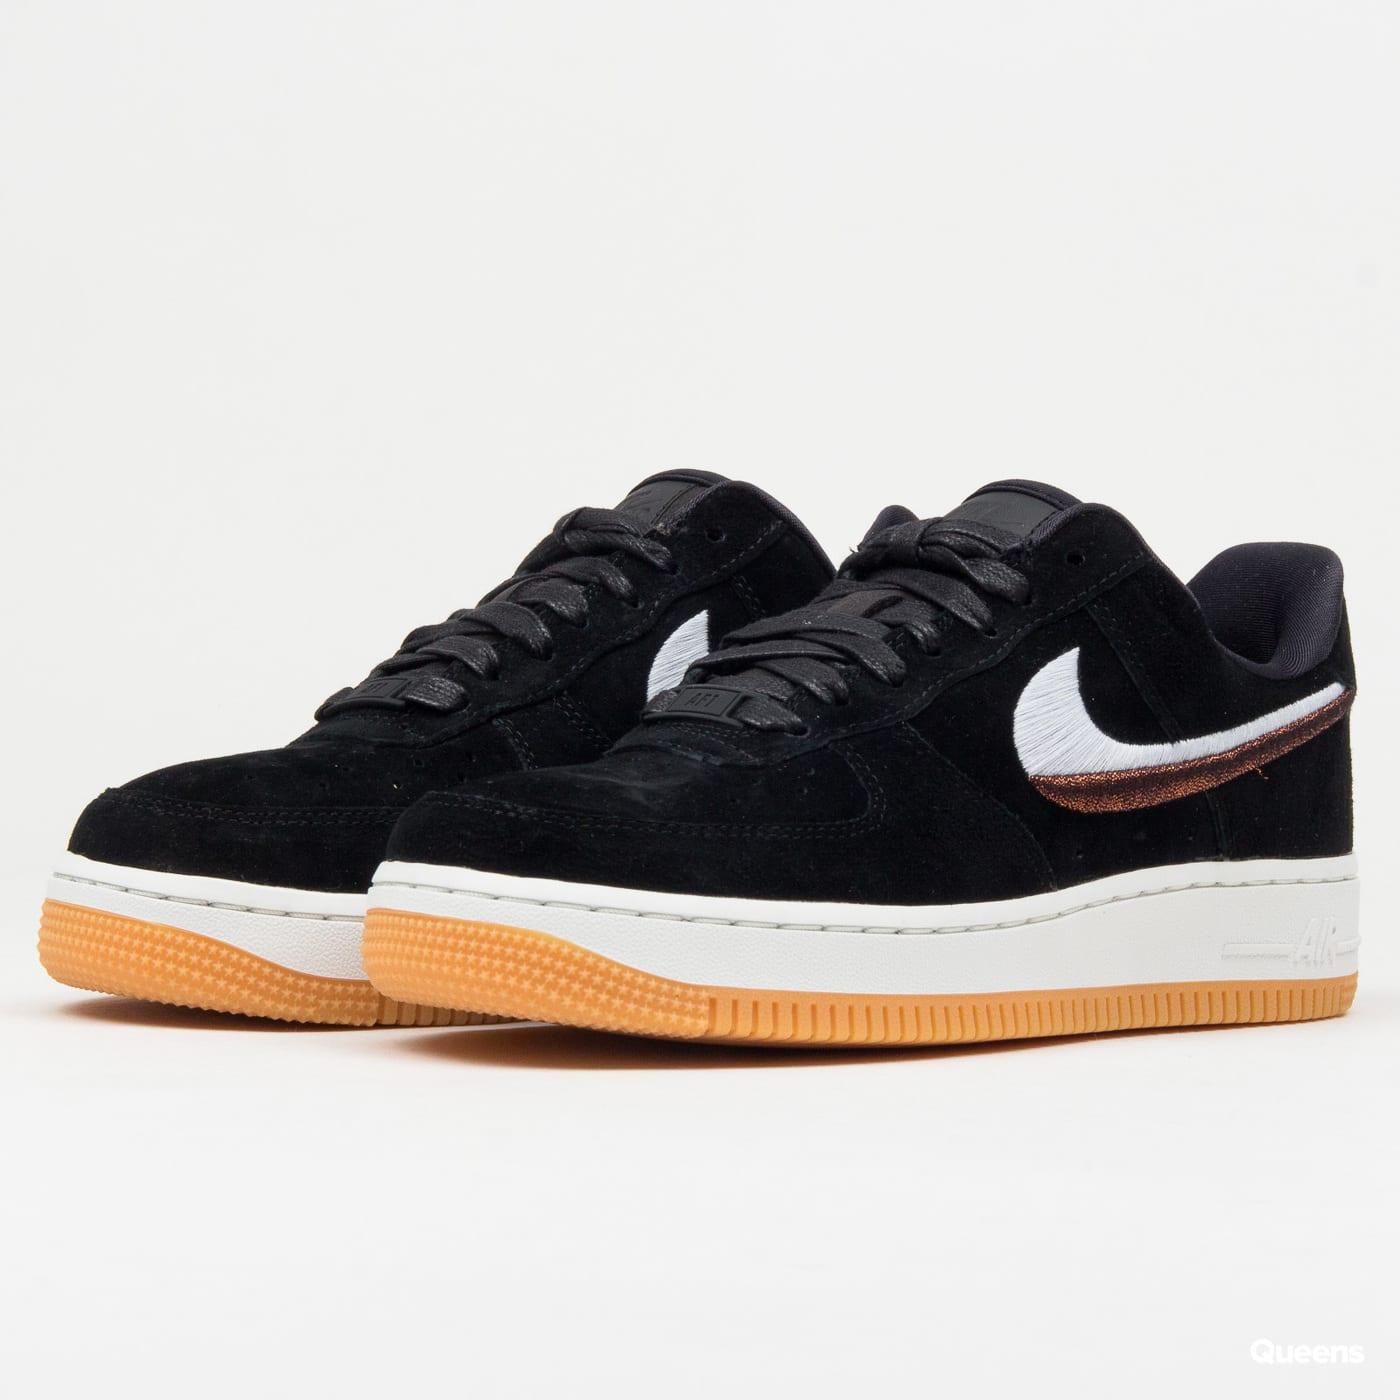 Nike WMNS Air Force 1  07 LX (898889-010) – Queens 💚 639b8ffb0c1